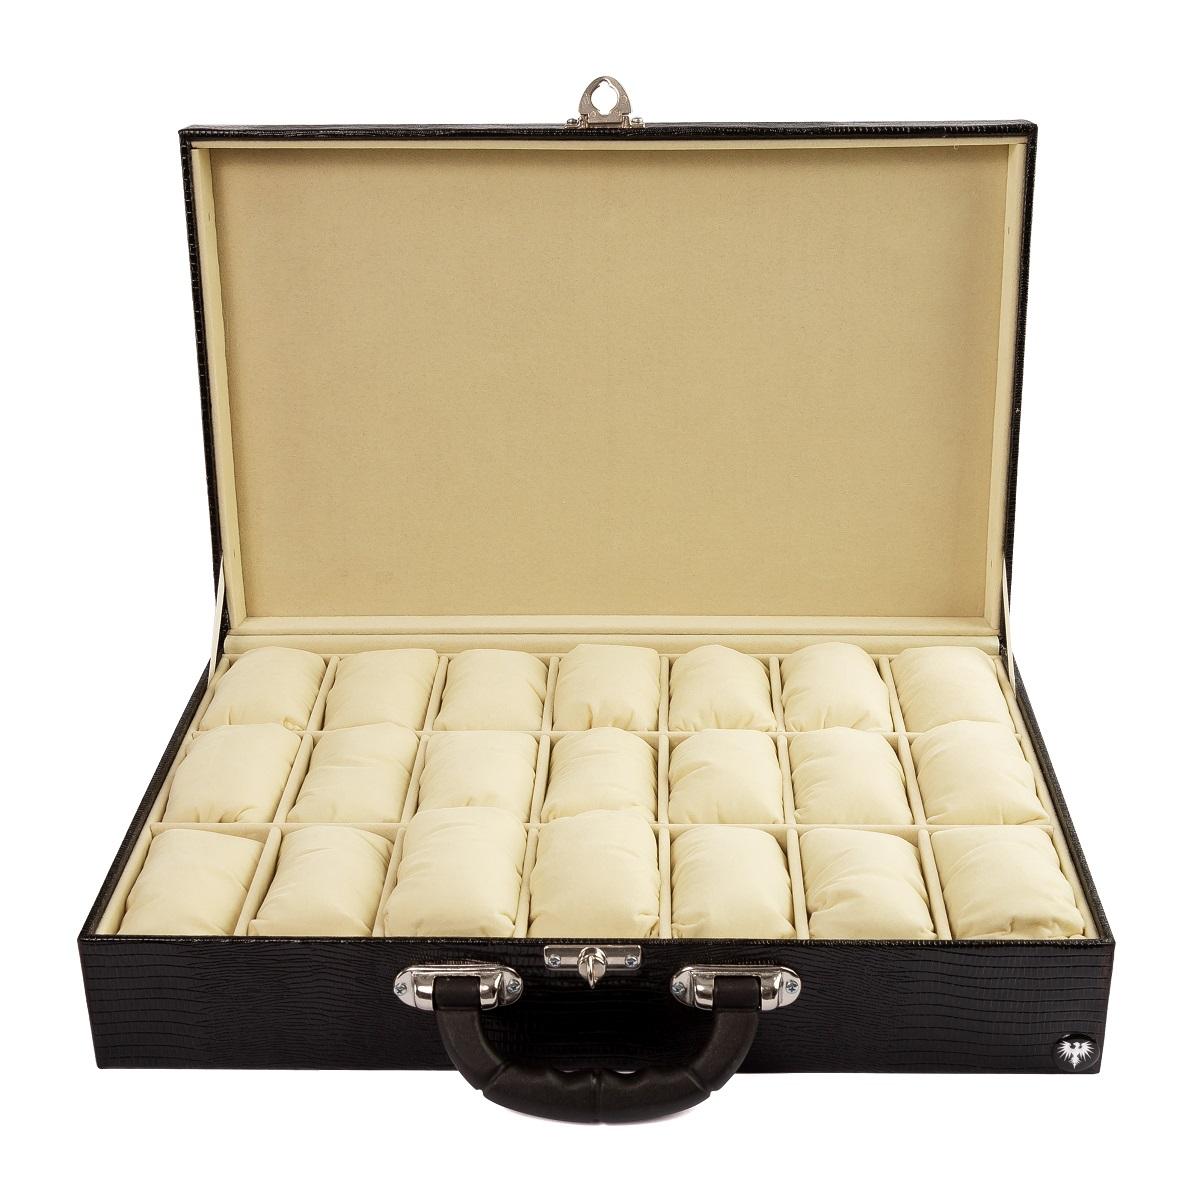 maleta-porta-relogio-21-nichos-couro-ecologico-preto-bege-imagem-2.jpg